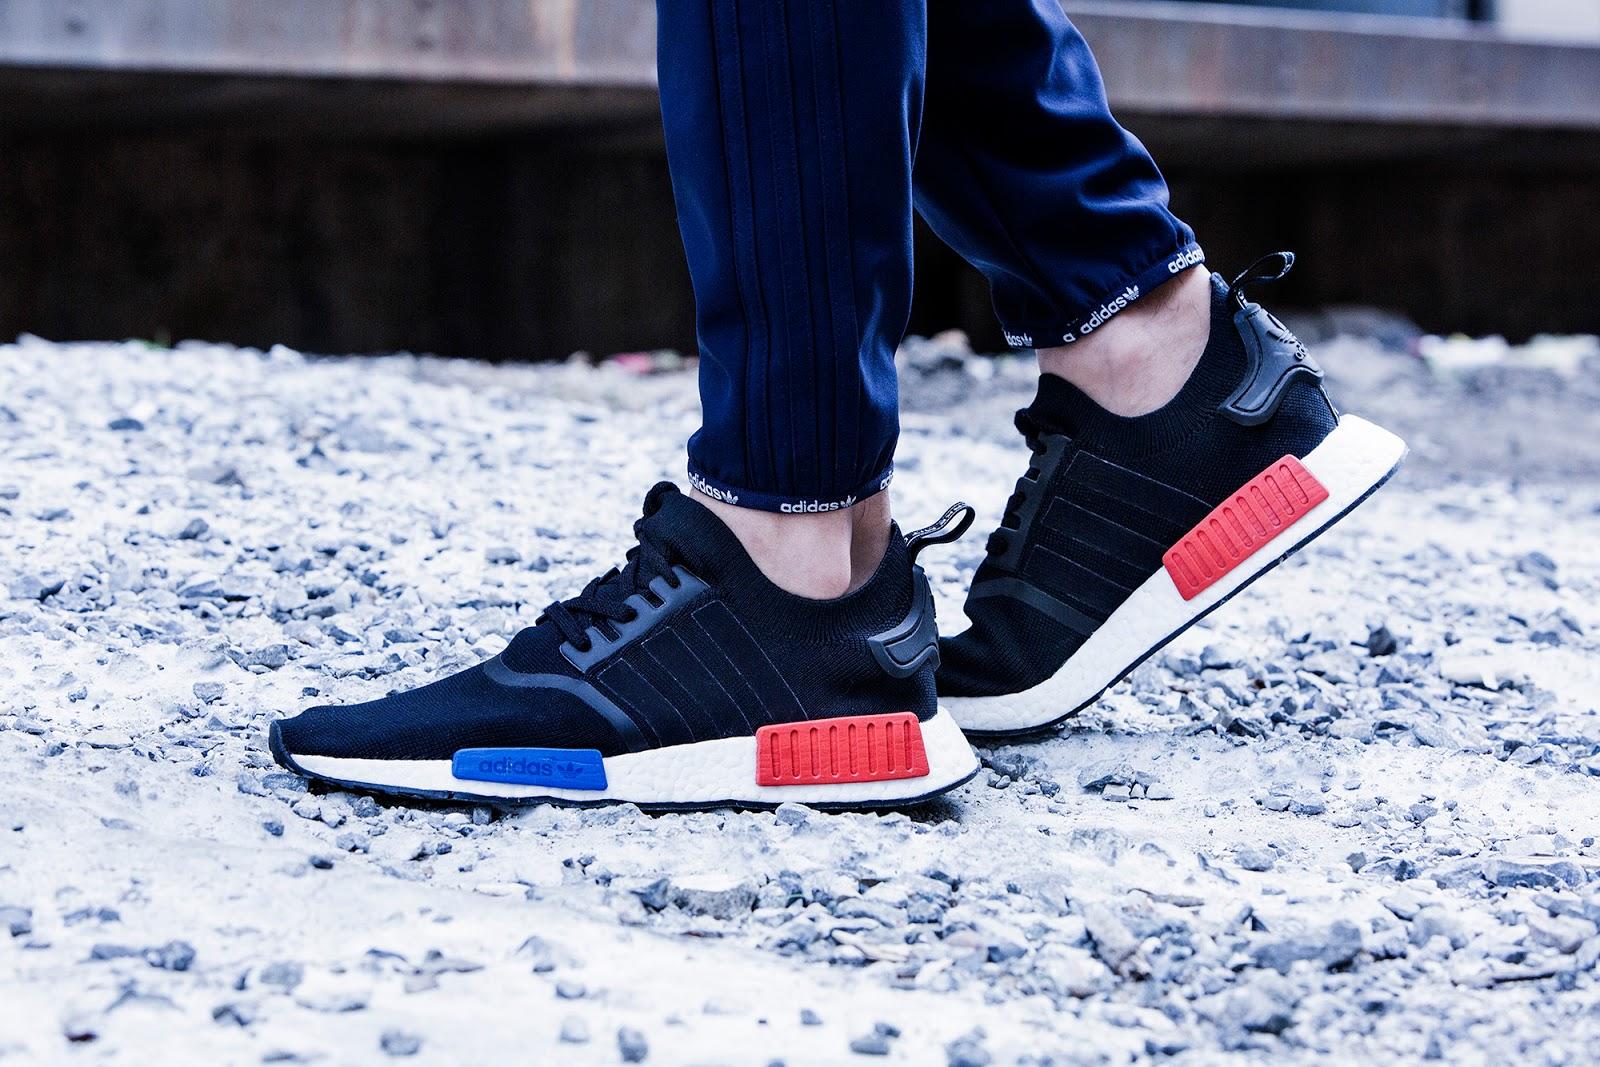 Adidas Originals Womens Superstar Fashion Sneakers